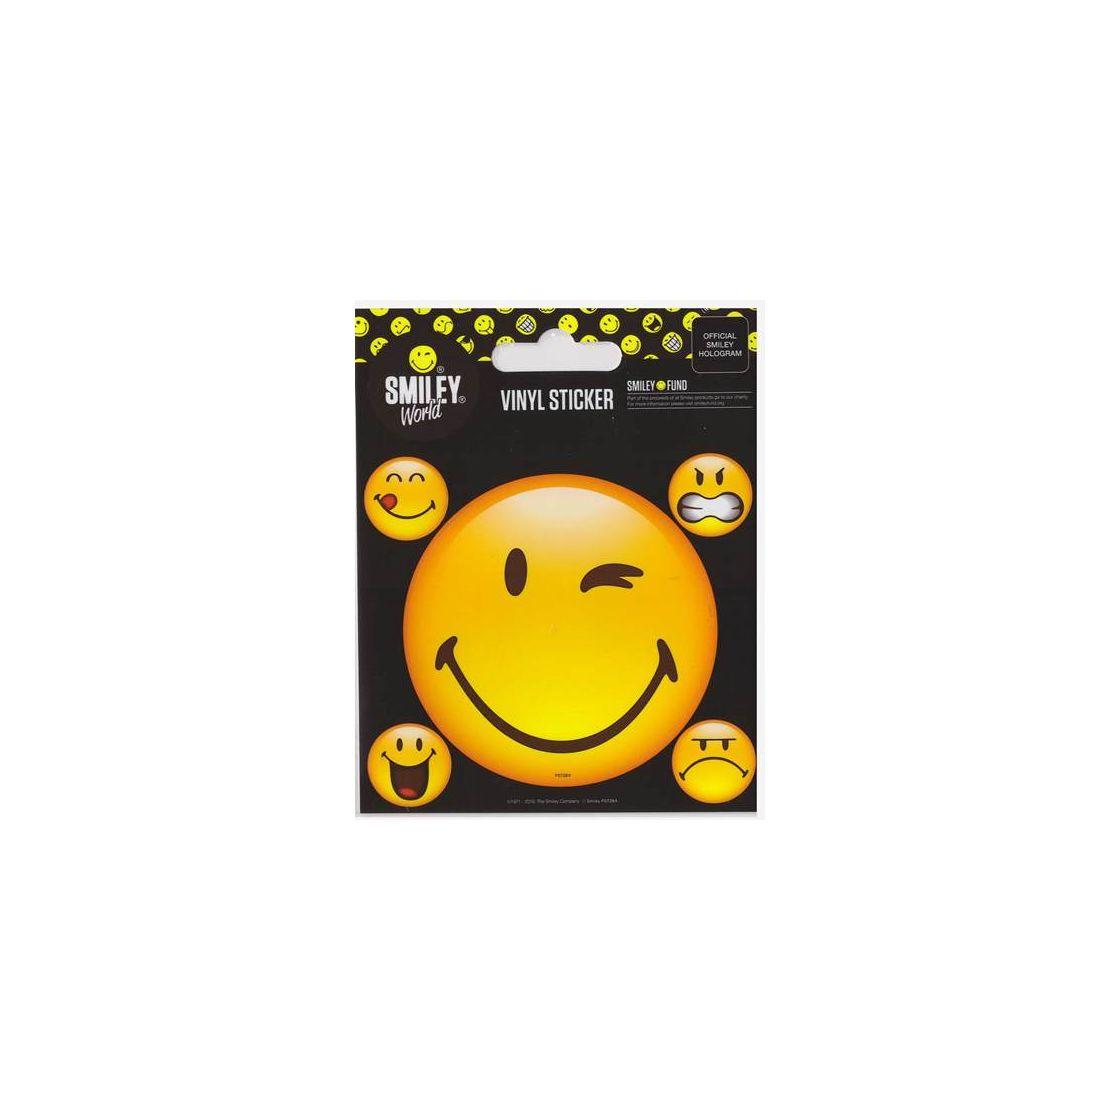 Smiley zwinkernder toihooktasupp: Smilie